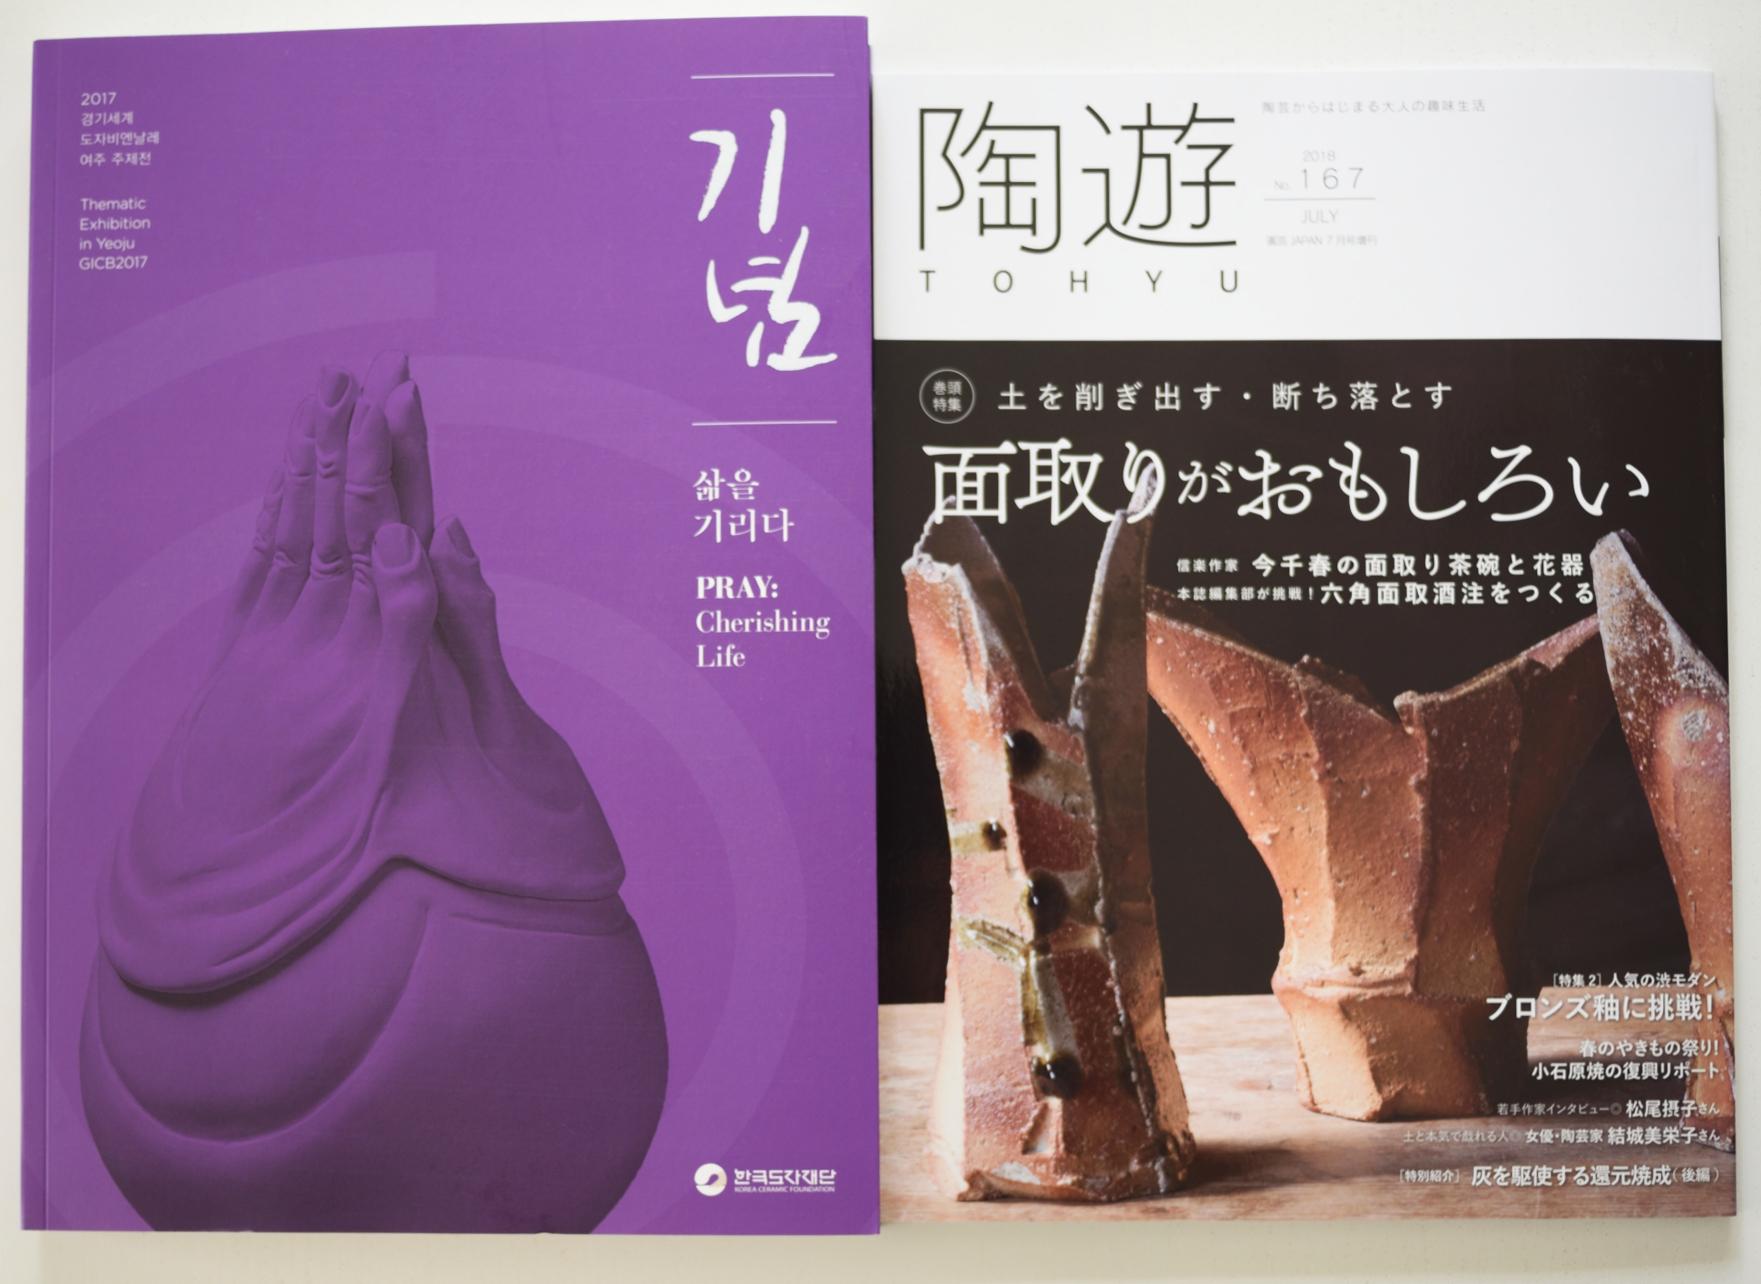 http://www.record-jp.com/news/entry_images/koreaandtohyu.jpg